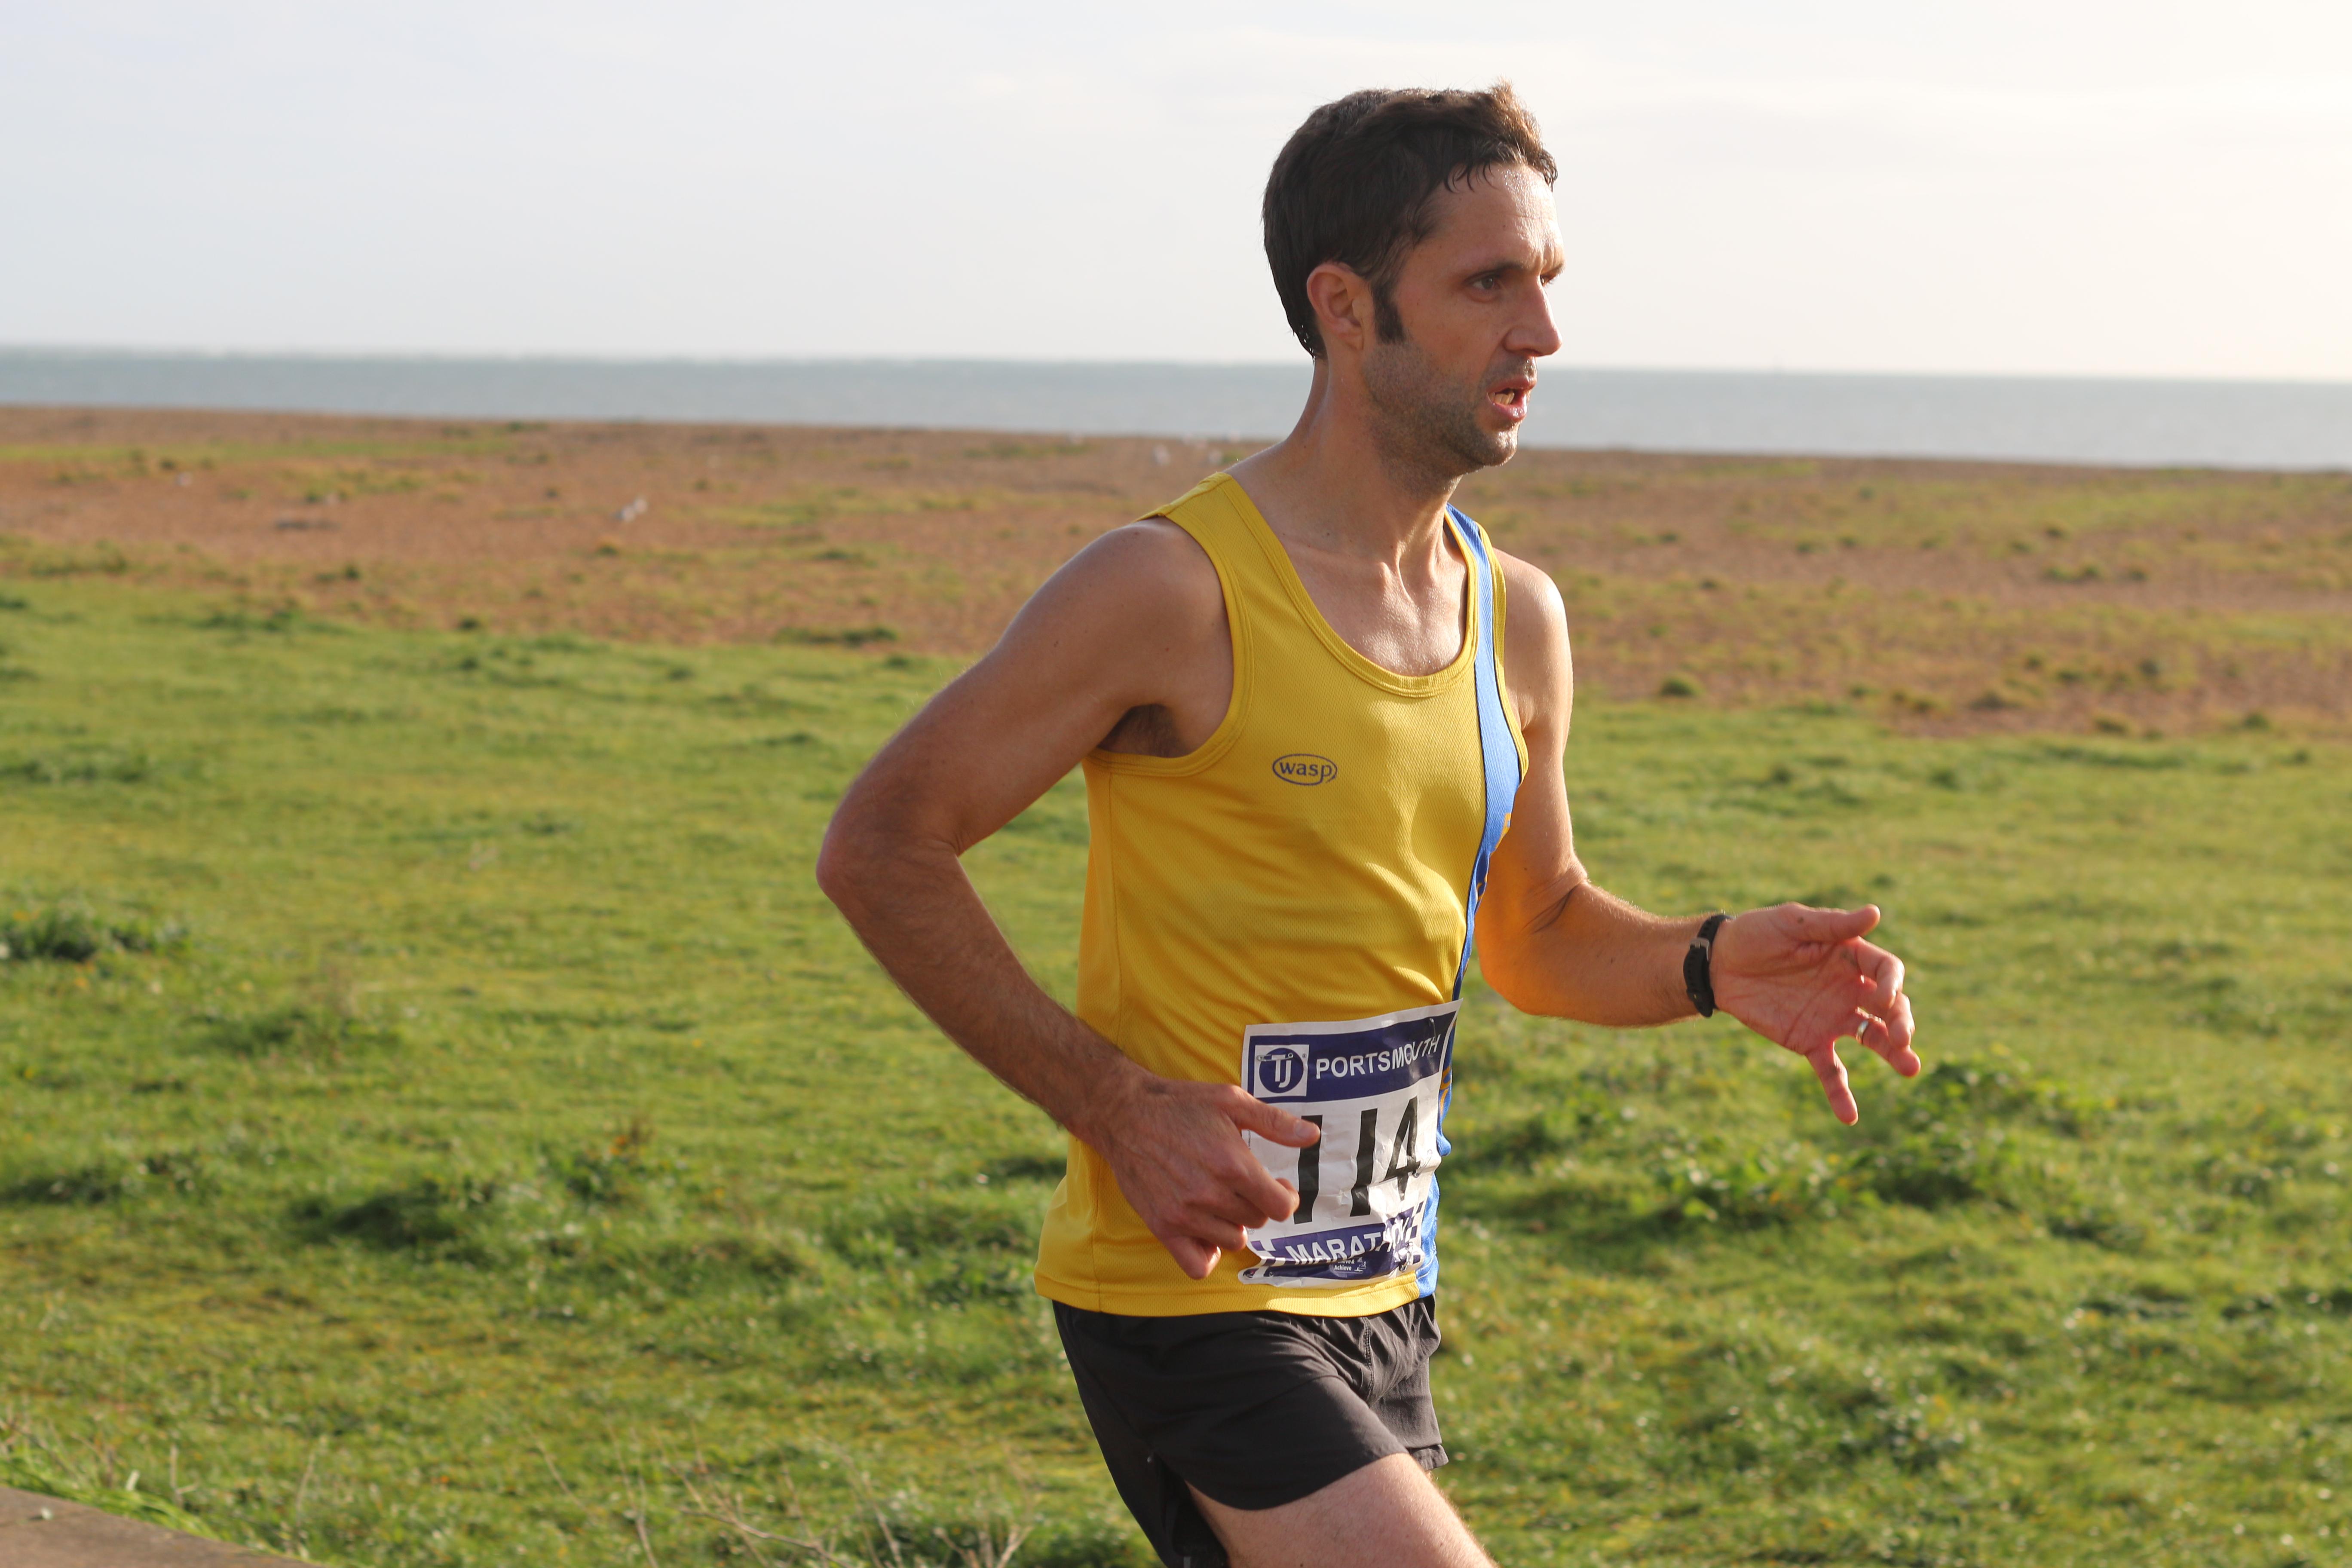 Jez Bragg in the Portsmouth Coastal Marathon